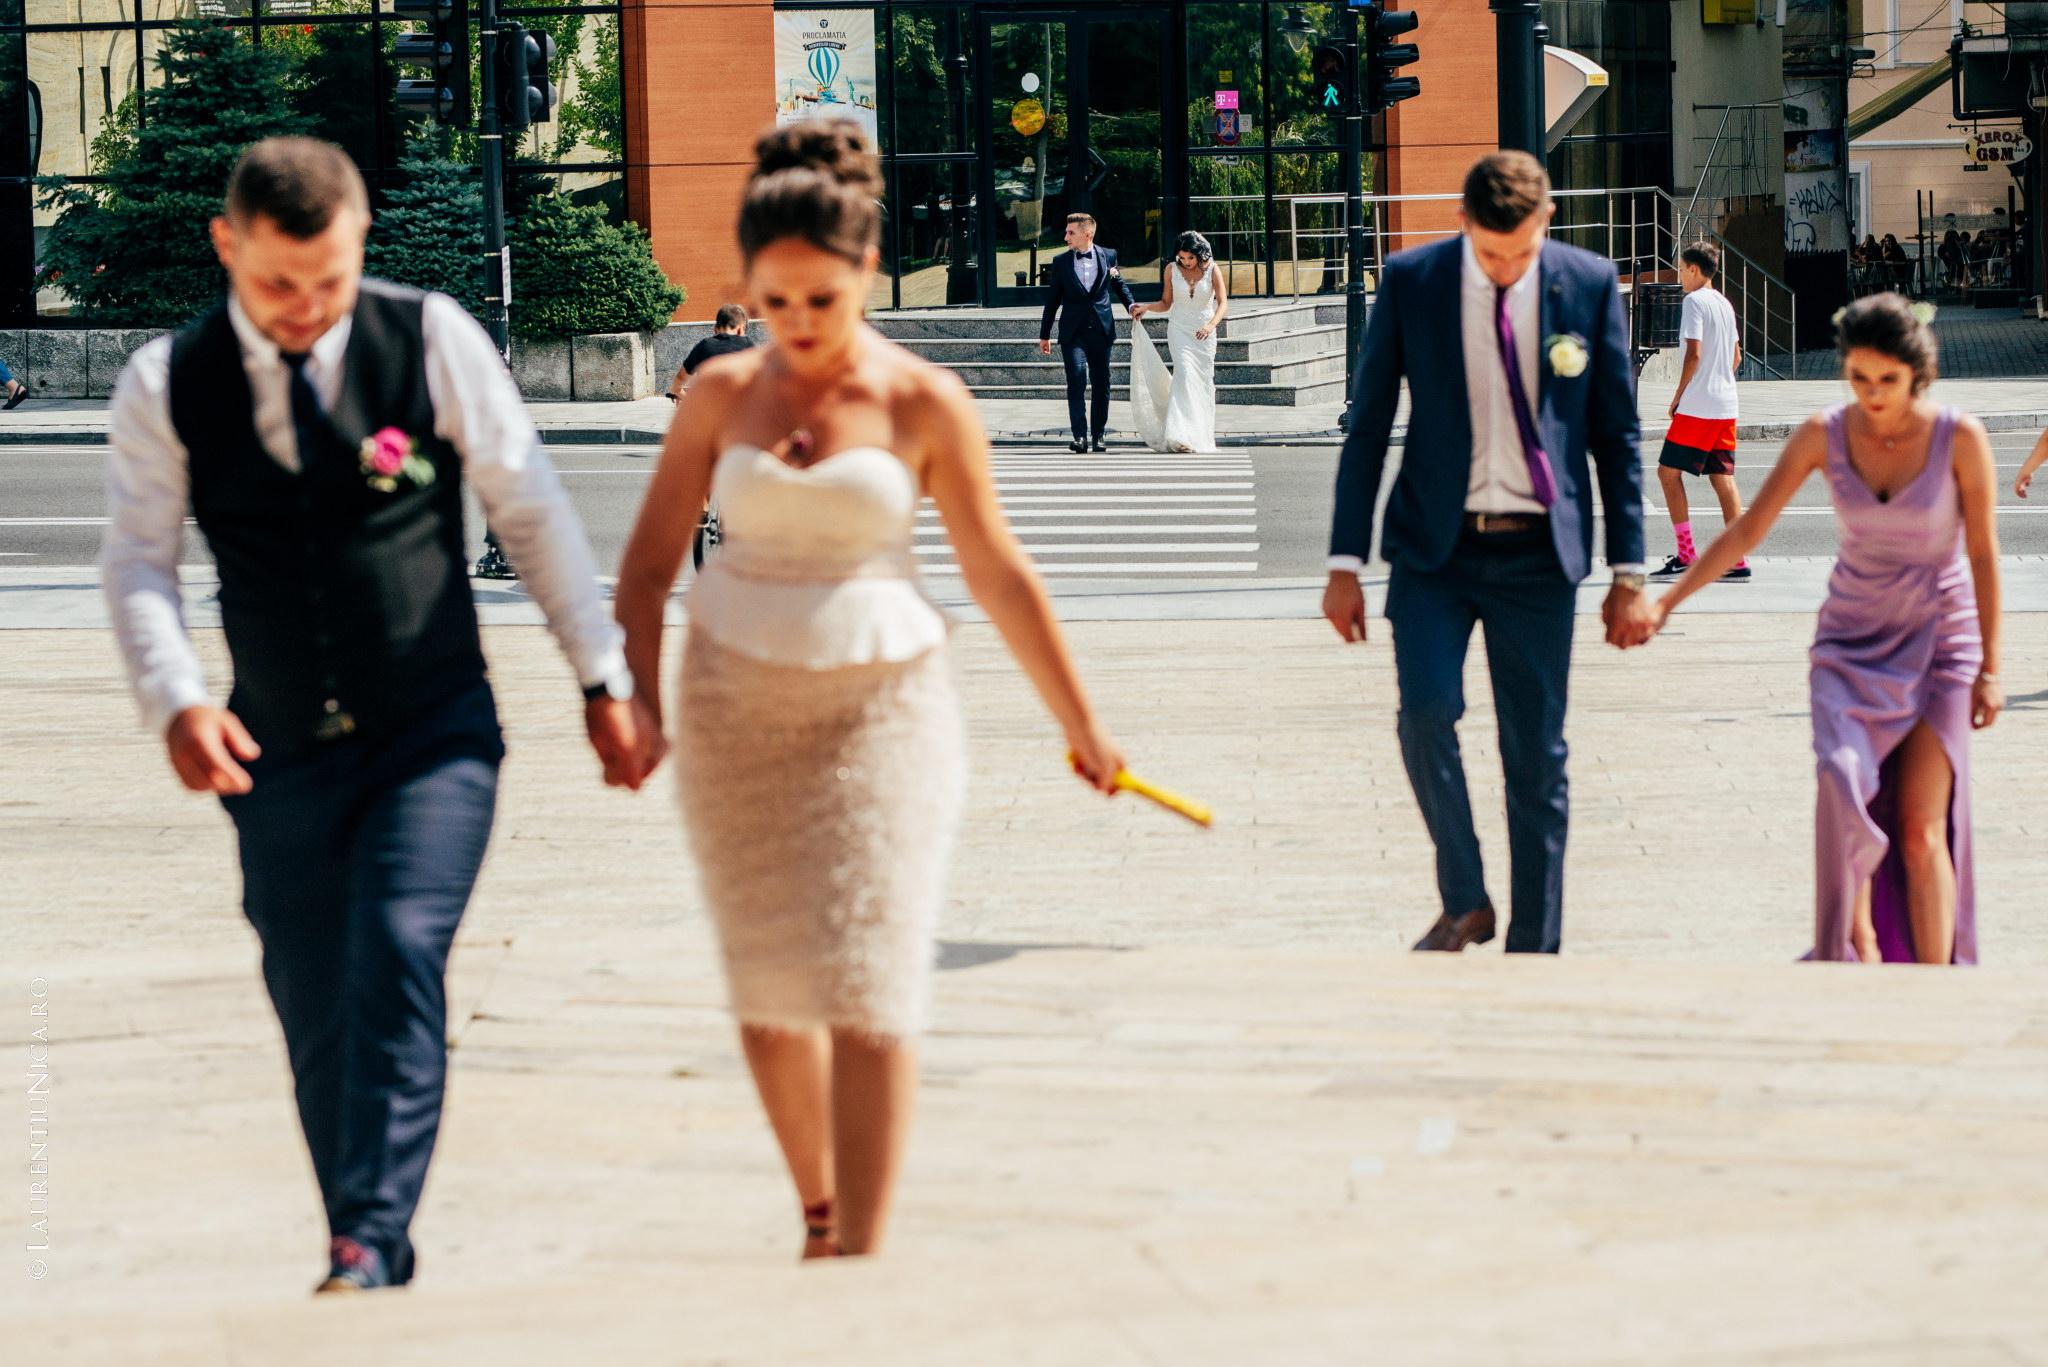 fotografii nunta craiova bia alex fotograf nunta laurentiu nica 27 - Bia & Alex | Fotografii nunta | Craiova